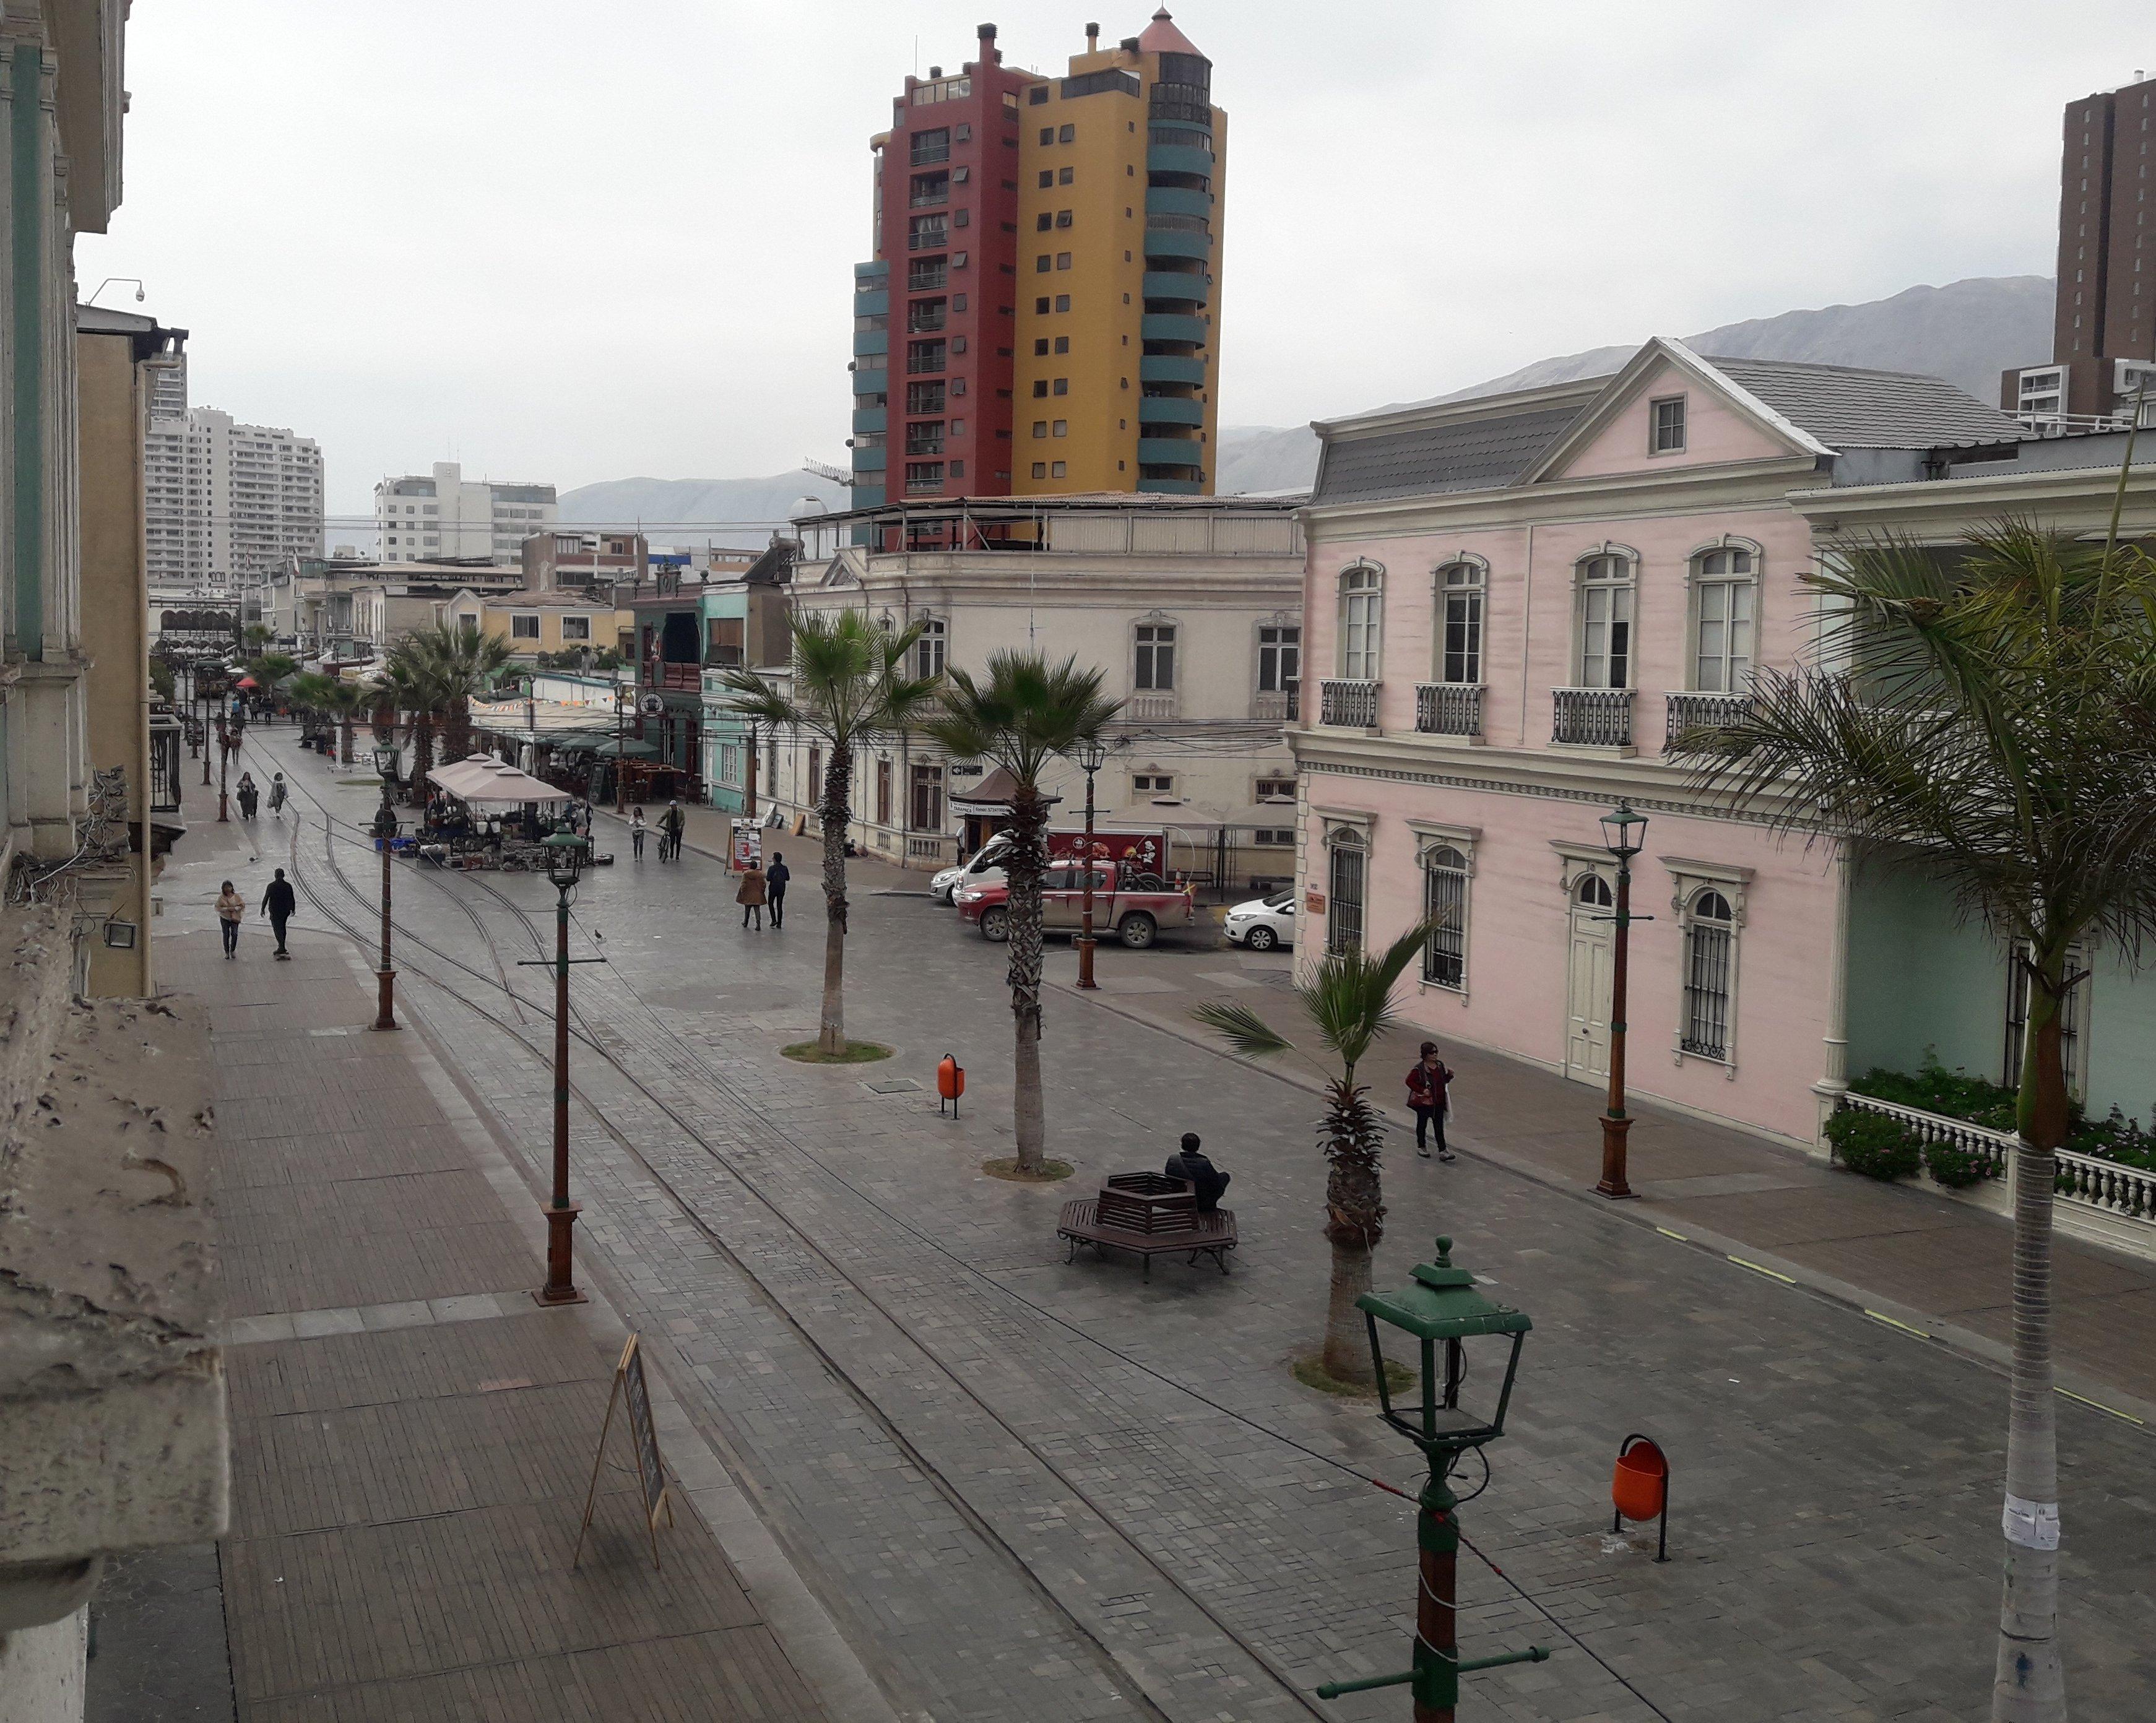 vista elevada del paseo peatonal con un edificio al fondo